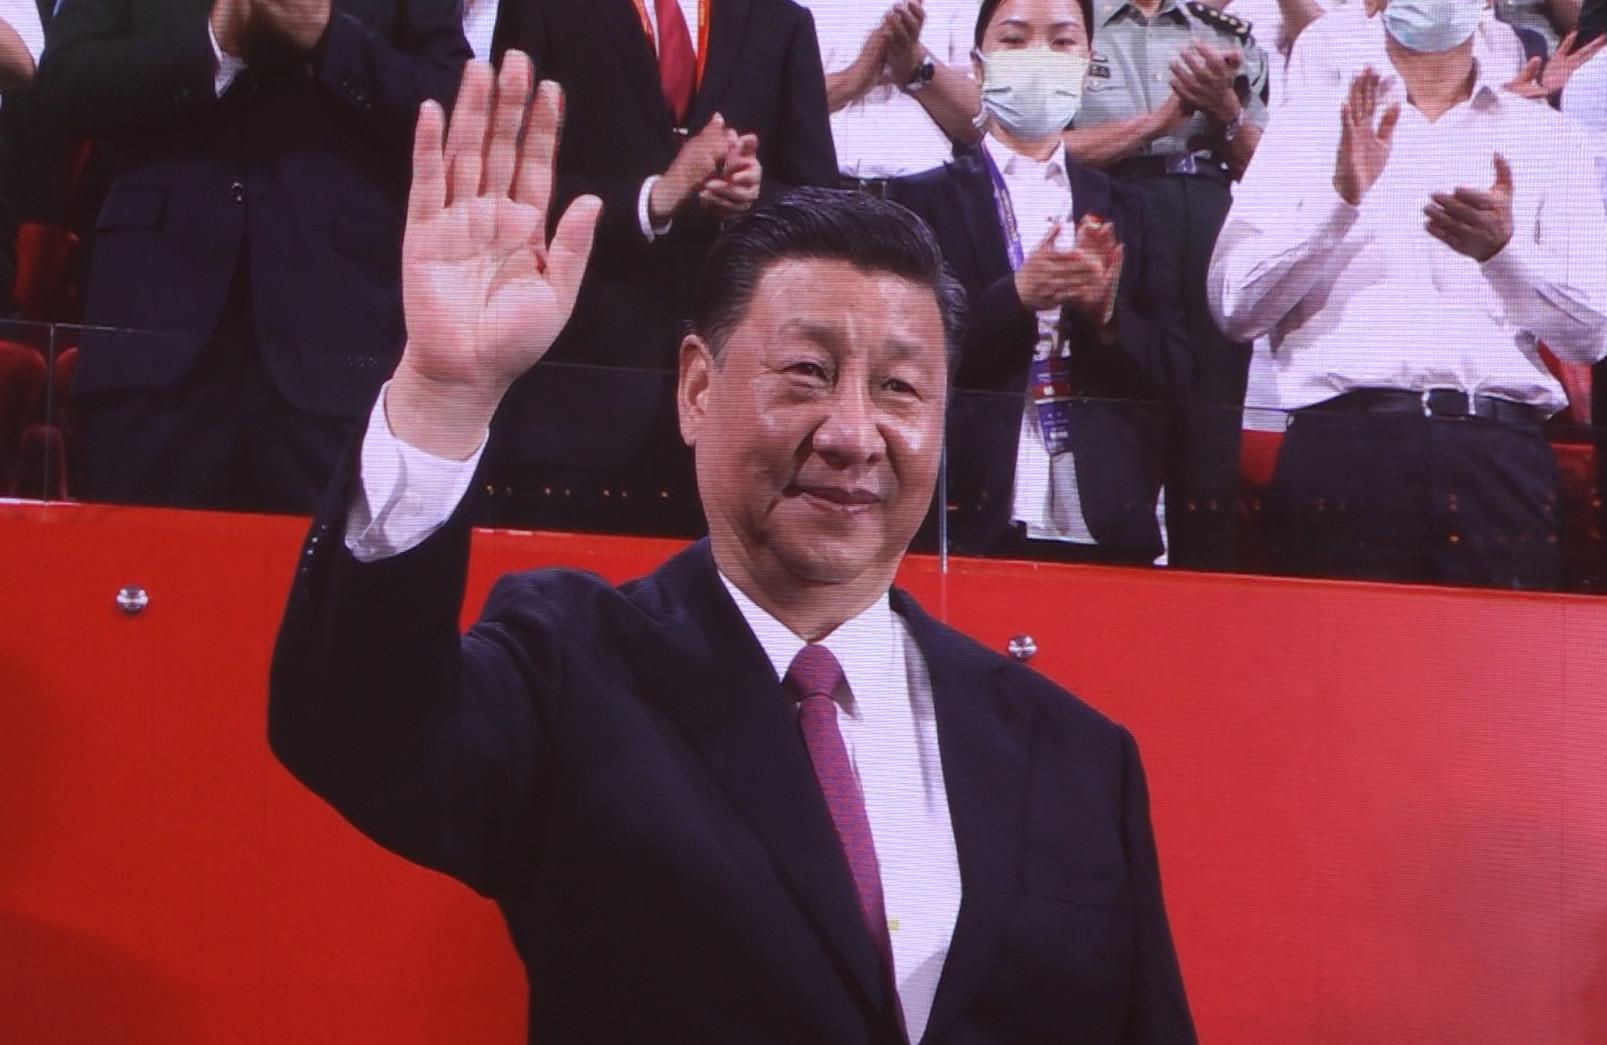 COVID-19,疫情,習近平,中國故事,戰狼外交,民族主義,中國崛起